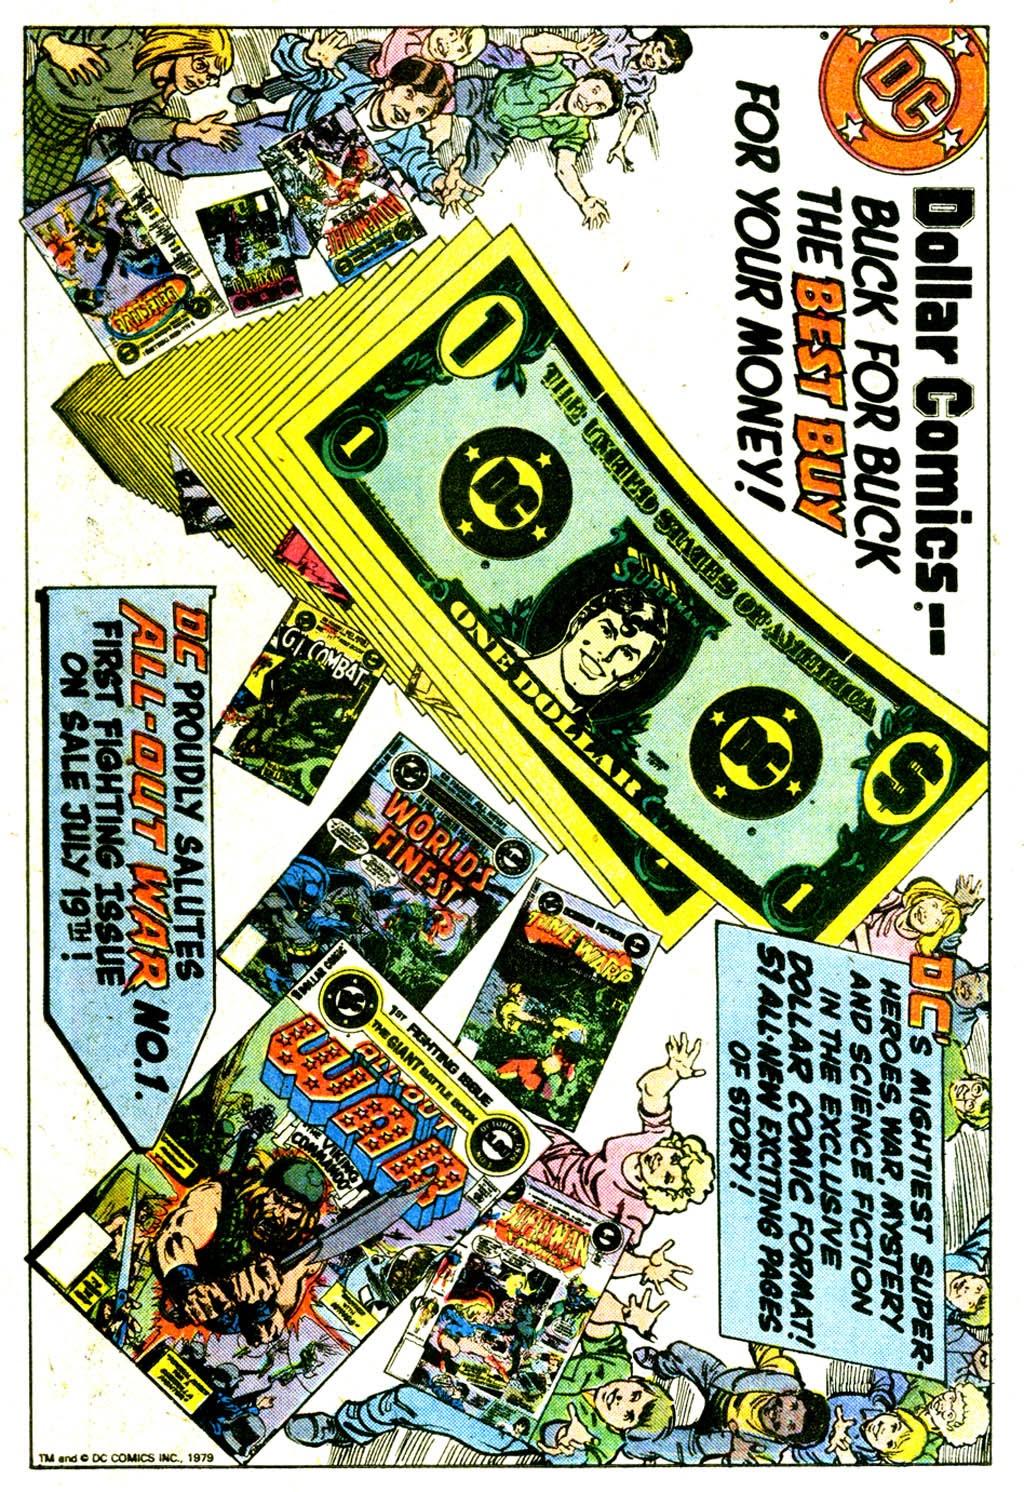 Read online Sgt. Rock comic -  Issue #332 - 17